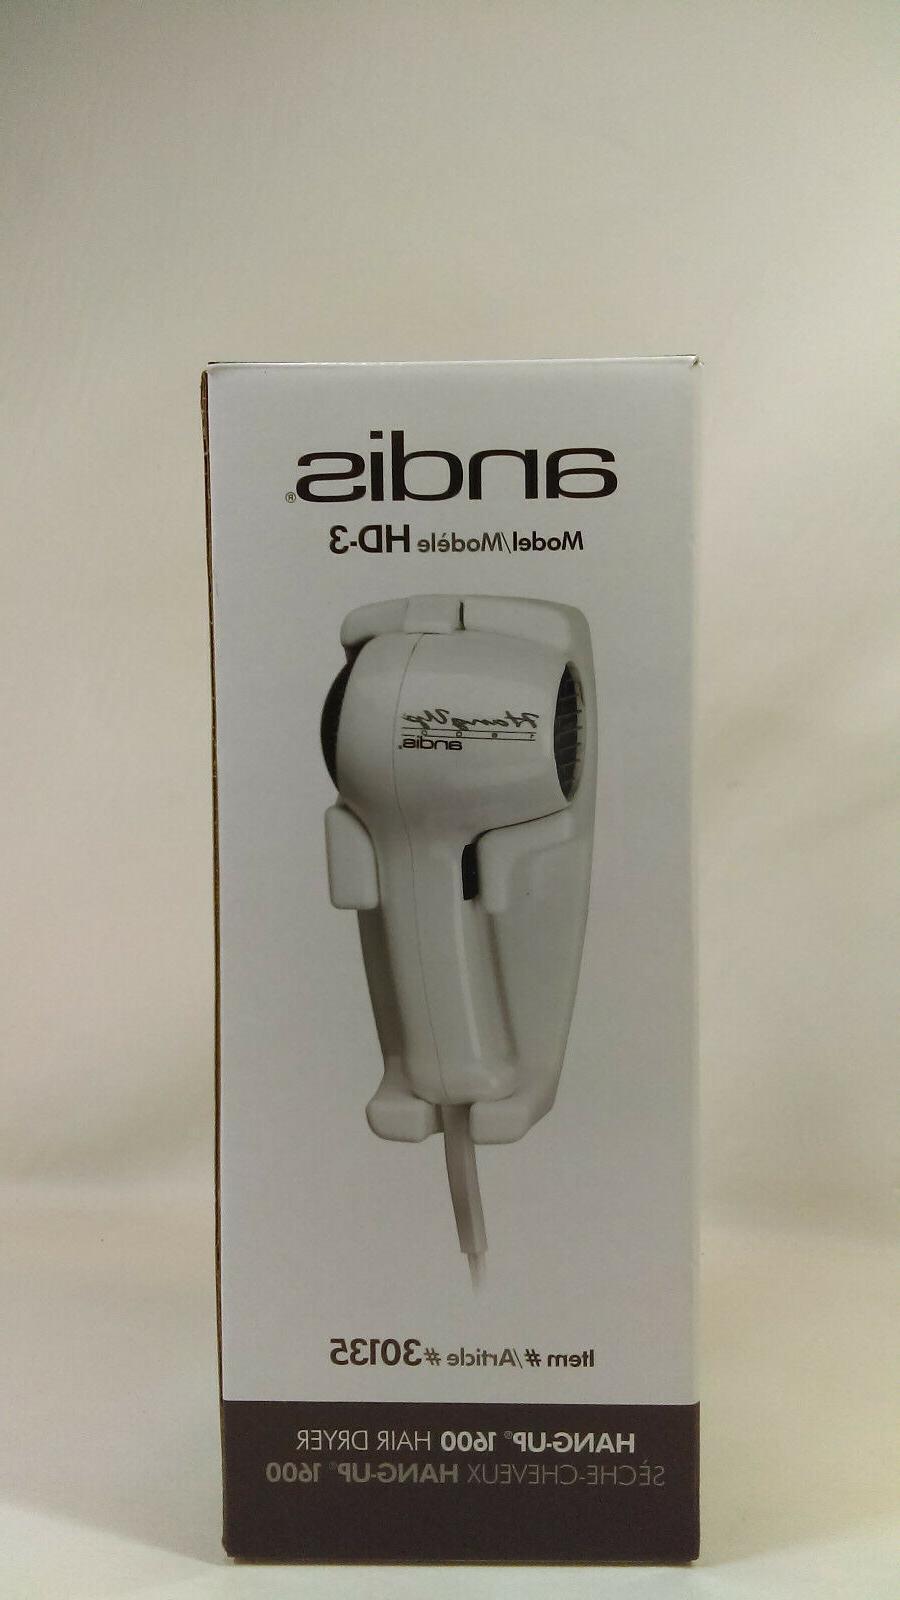 1600 watt wall mounted hangup hair dryer